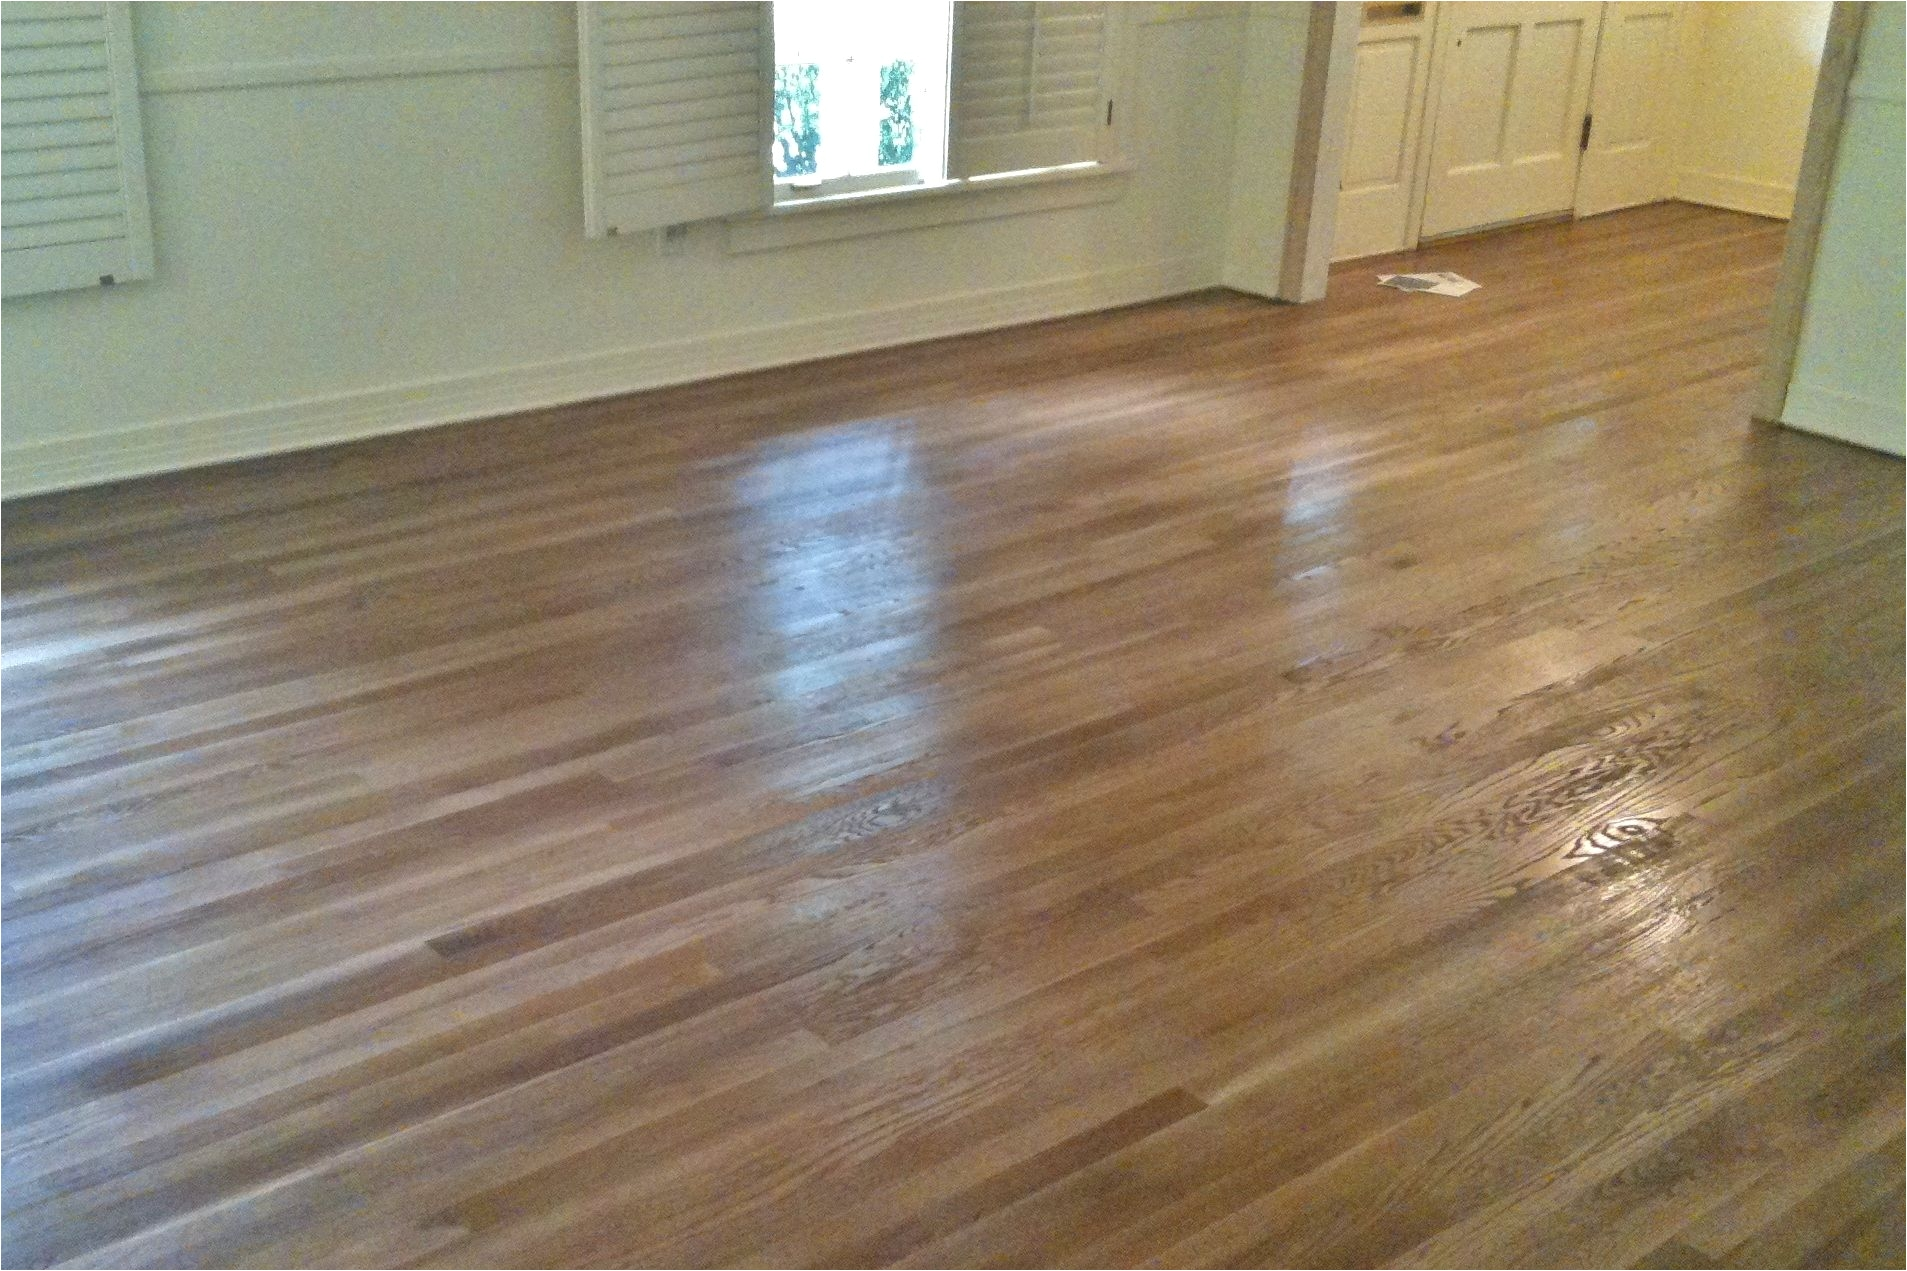 minwax special walnut stain on oak hardwood floors